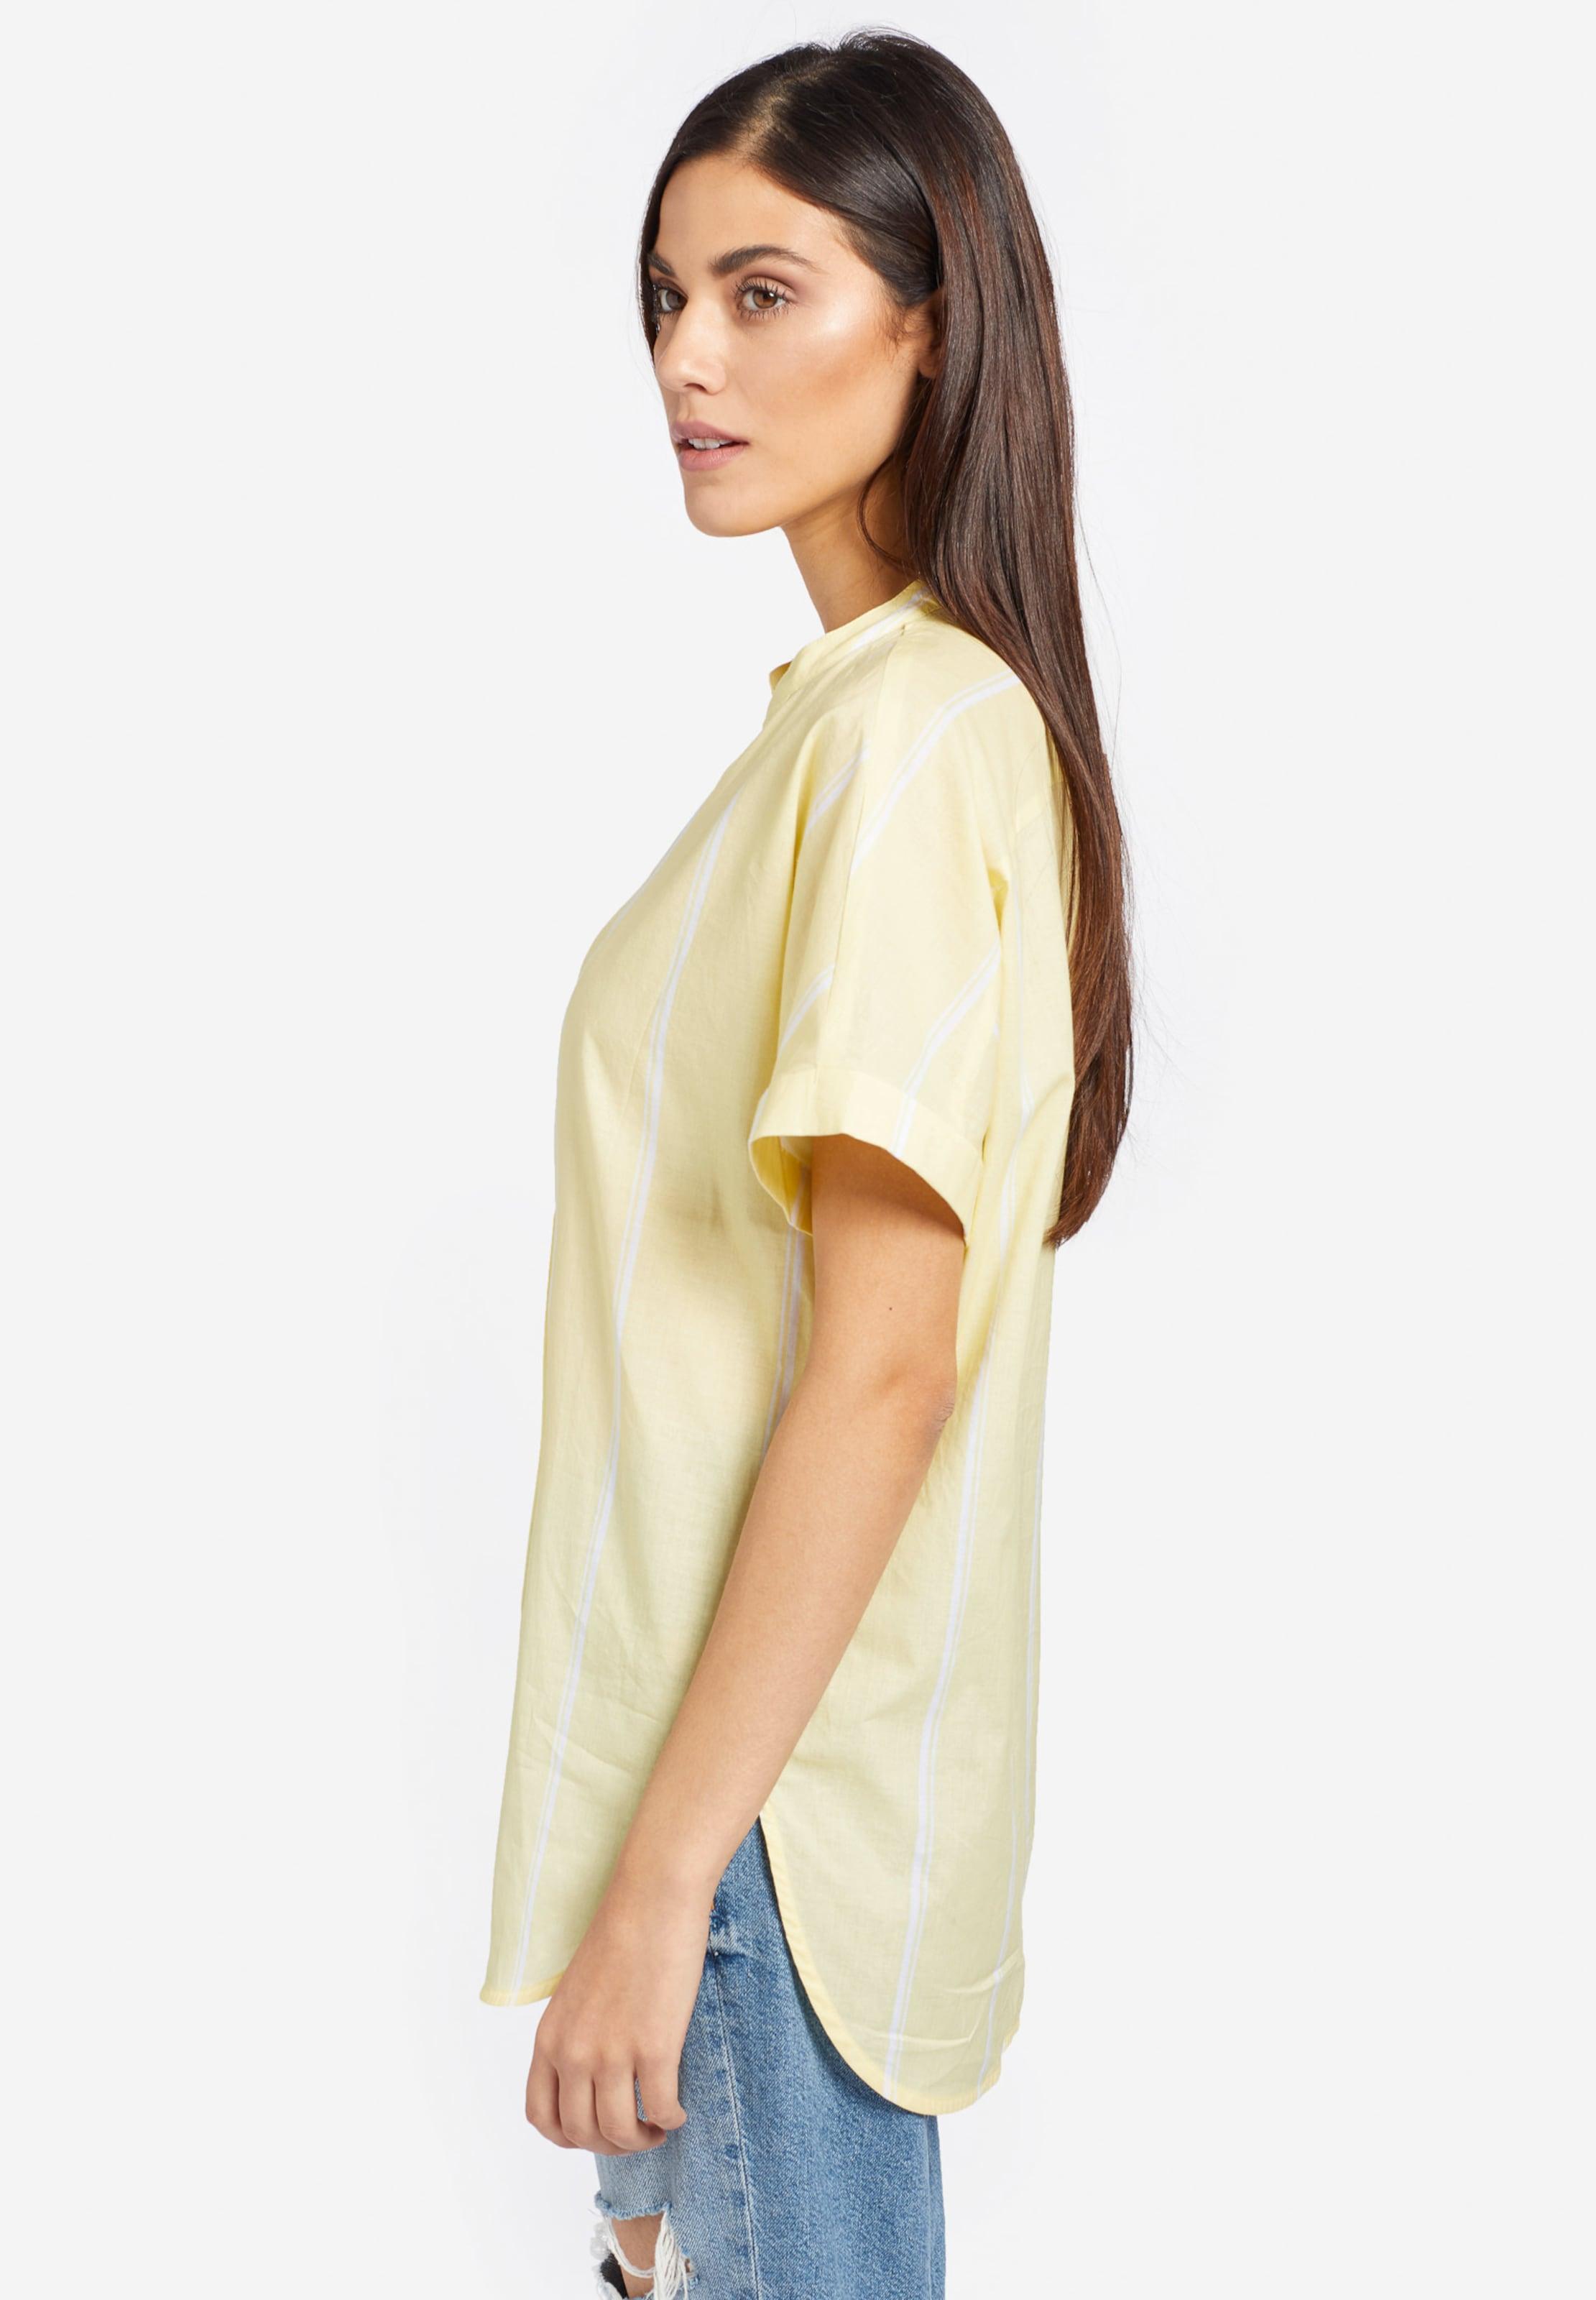 In HellgelbWeiß Khujo In 'nora' Khujo 'nora' Blusenshirt Blusenshirt tQCshdr